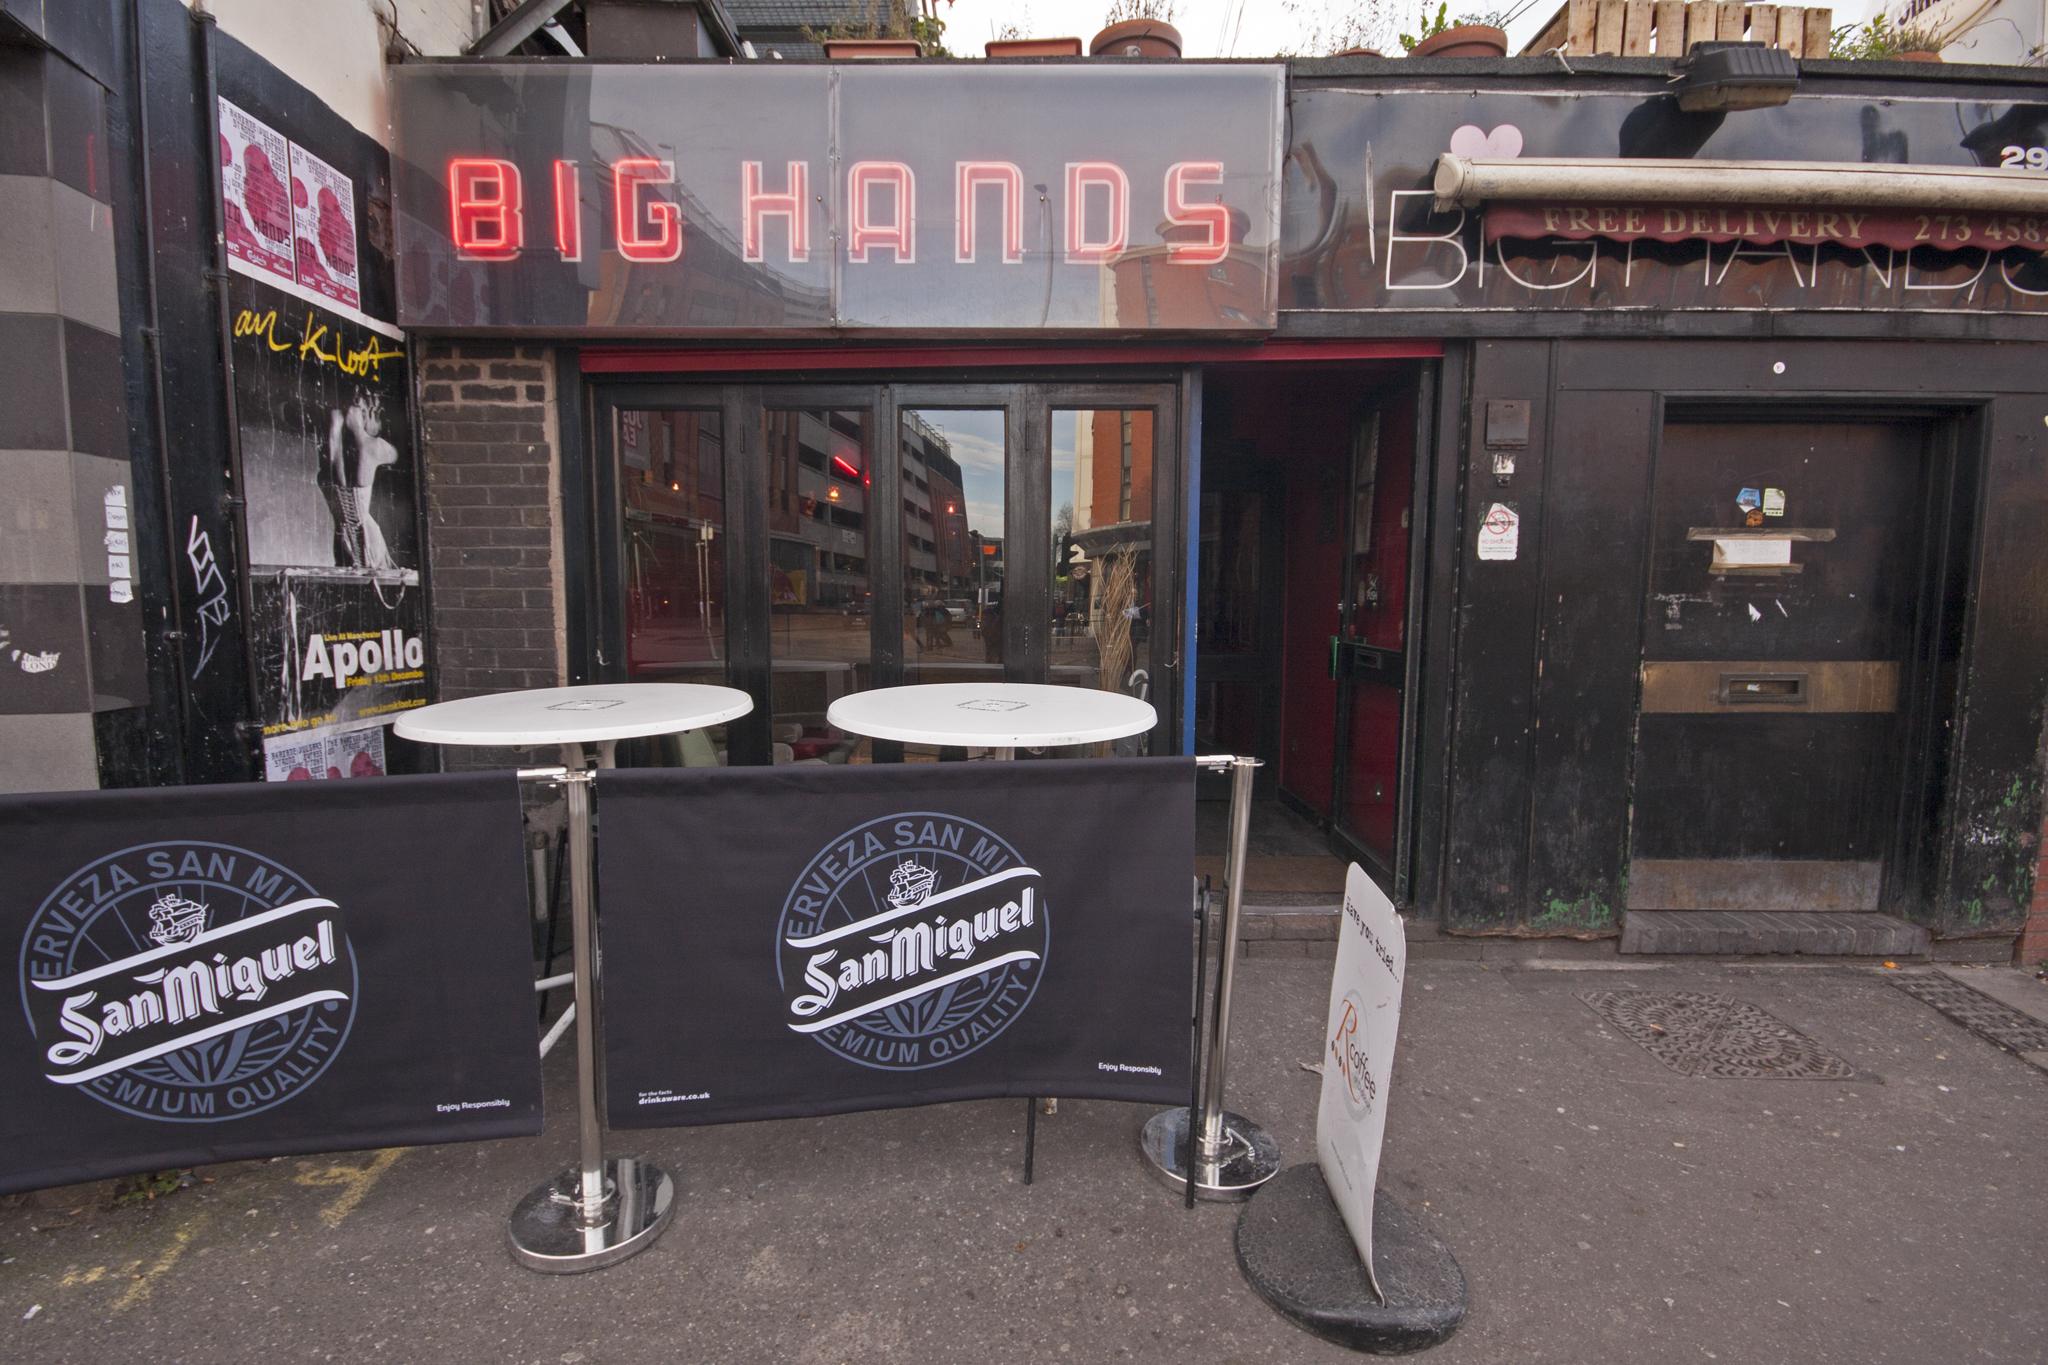 Big Hands, Nightlife, Manchester